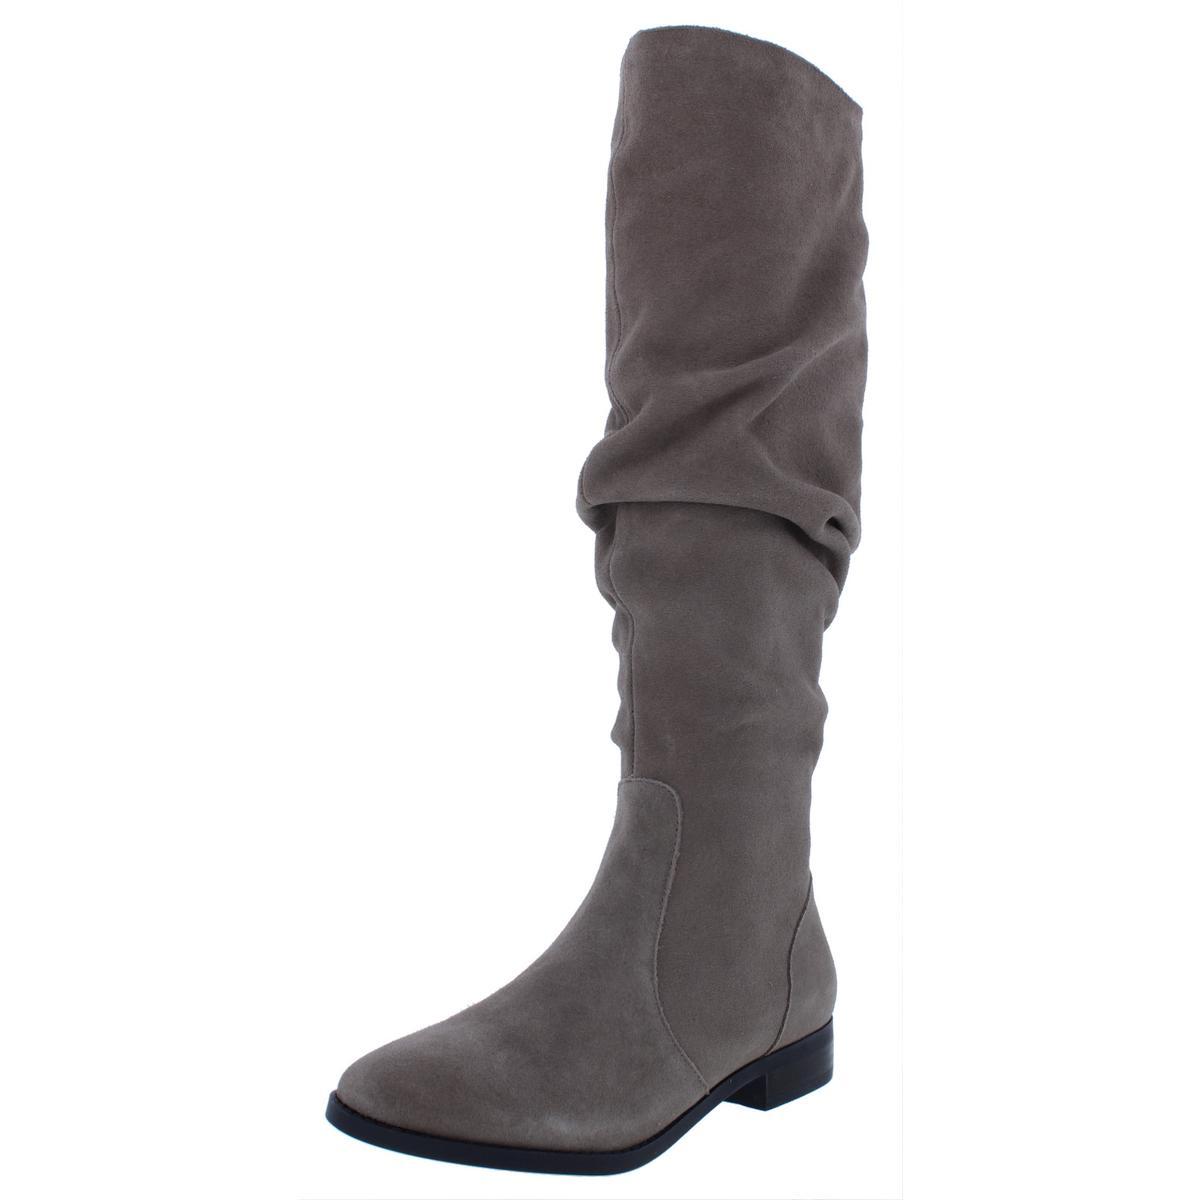 Steve Madden Womens Beacon Taupe Over-The-Knee Boots 5 Medium (B,M) BHFO 5002